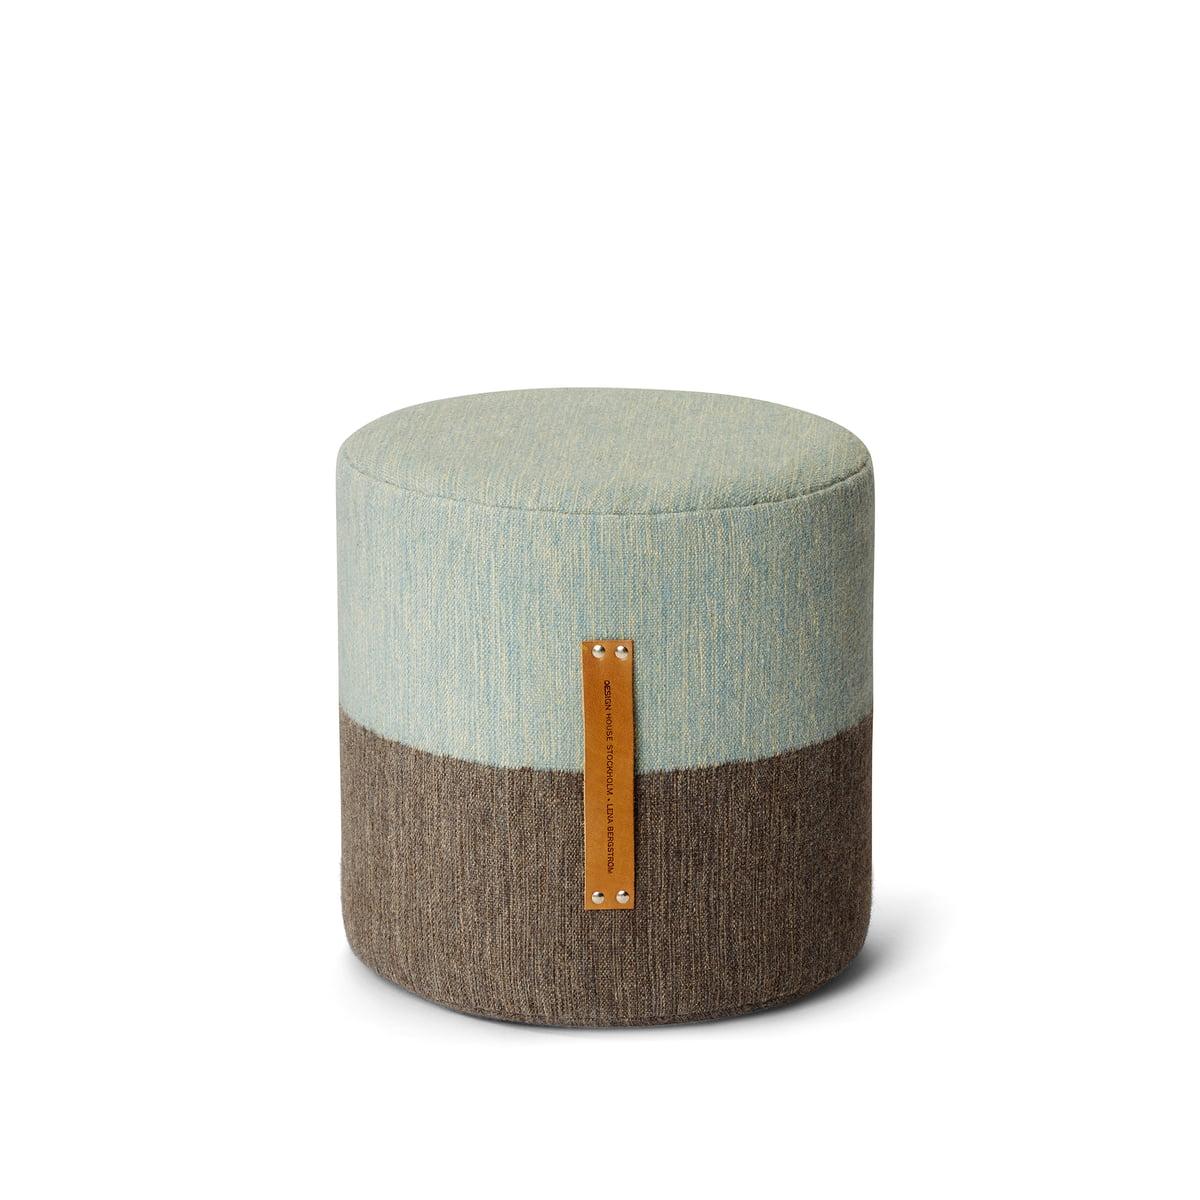 beautiful pouf design images amazing house design. Black Bedroom Furniture Sets. Home Design Ideas